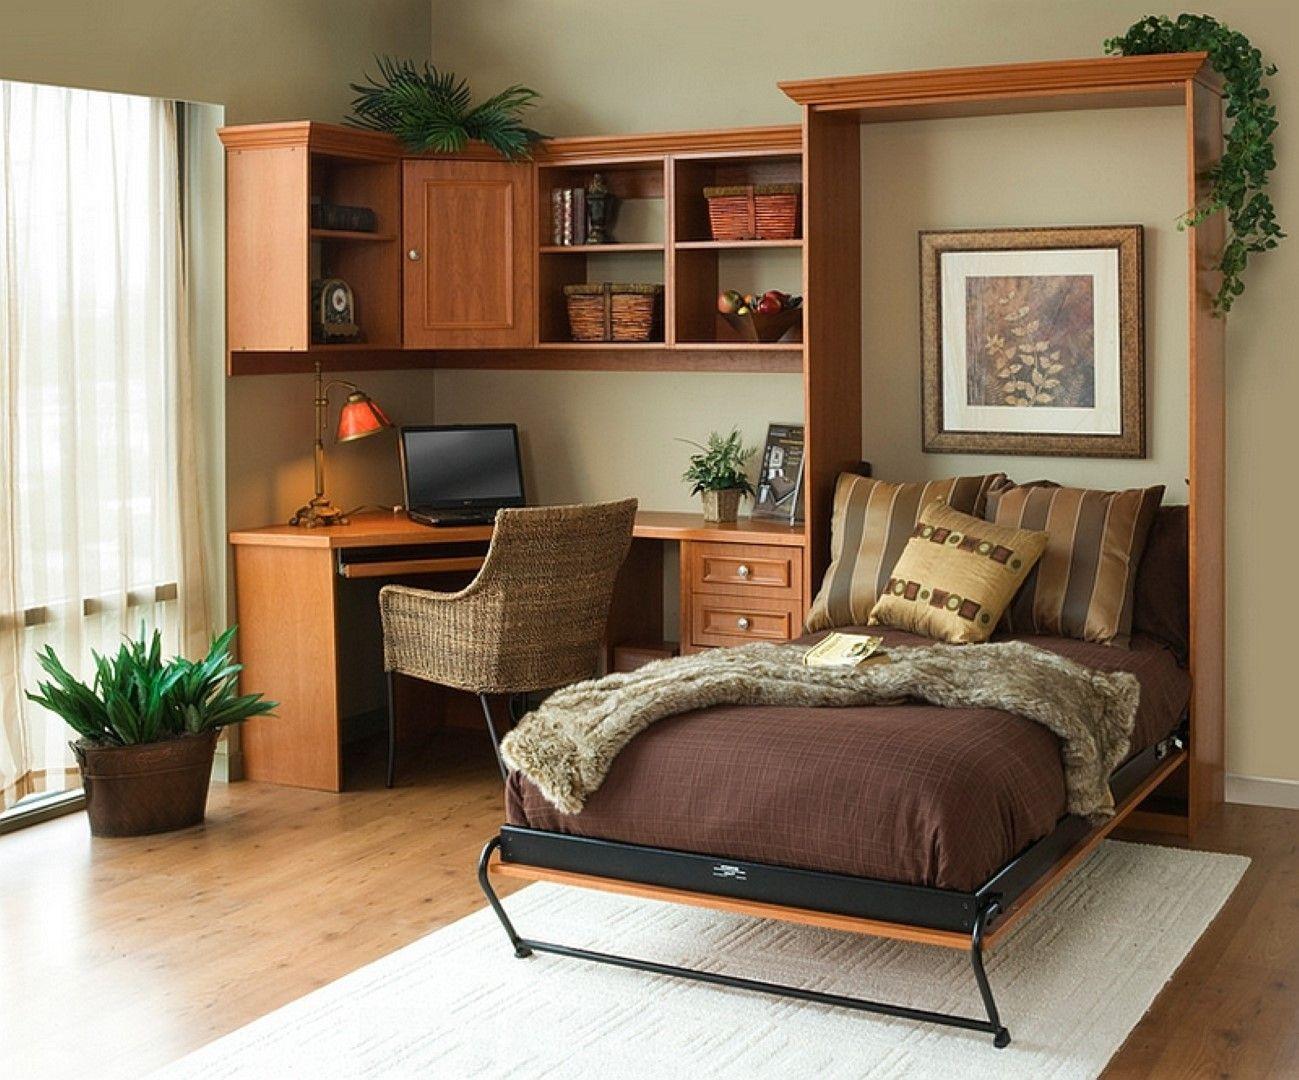 Sketch Of Comfortable Bedroom Design With Murphy Bed Kit Lowes Murphy Bed Office Bedroom Workspace Bedroom Office Combo